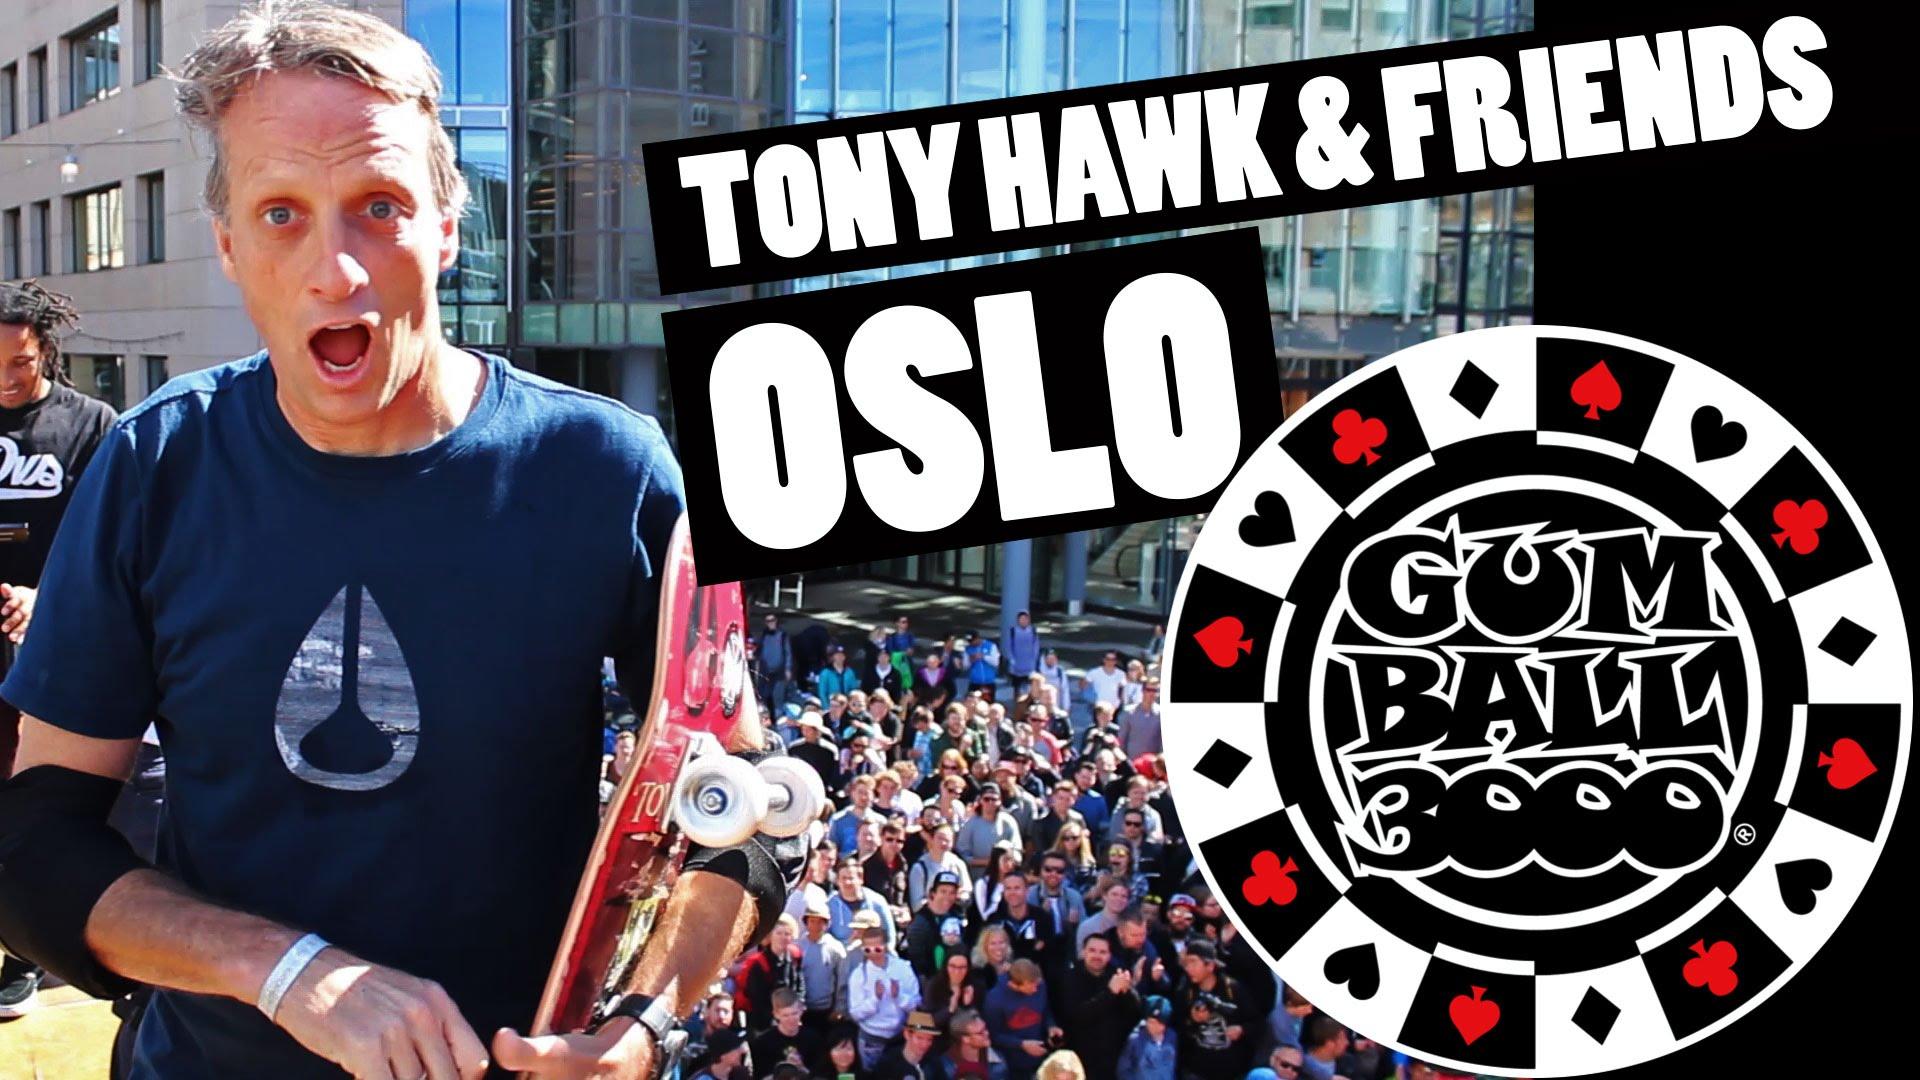 TONY HAWK & FRIENDS OSLO GUMBALL 3000